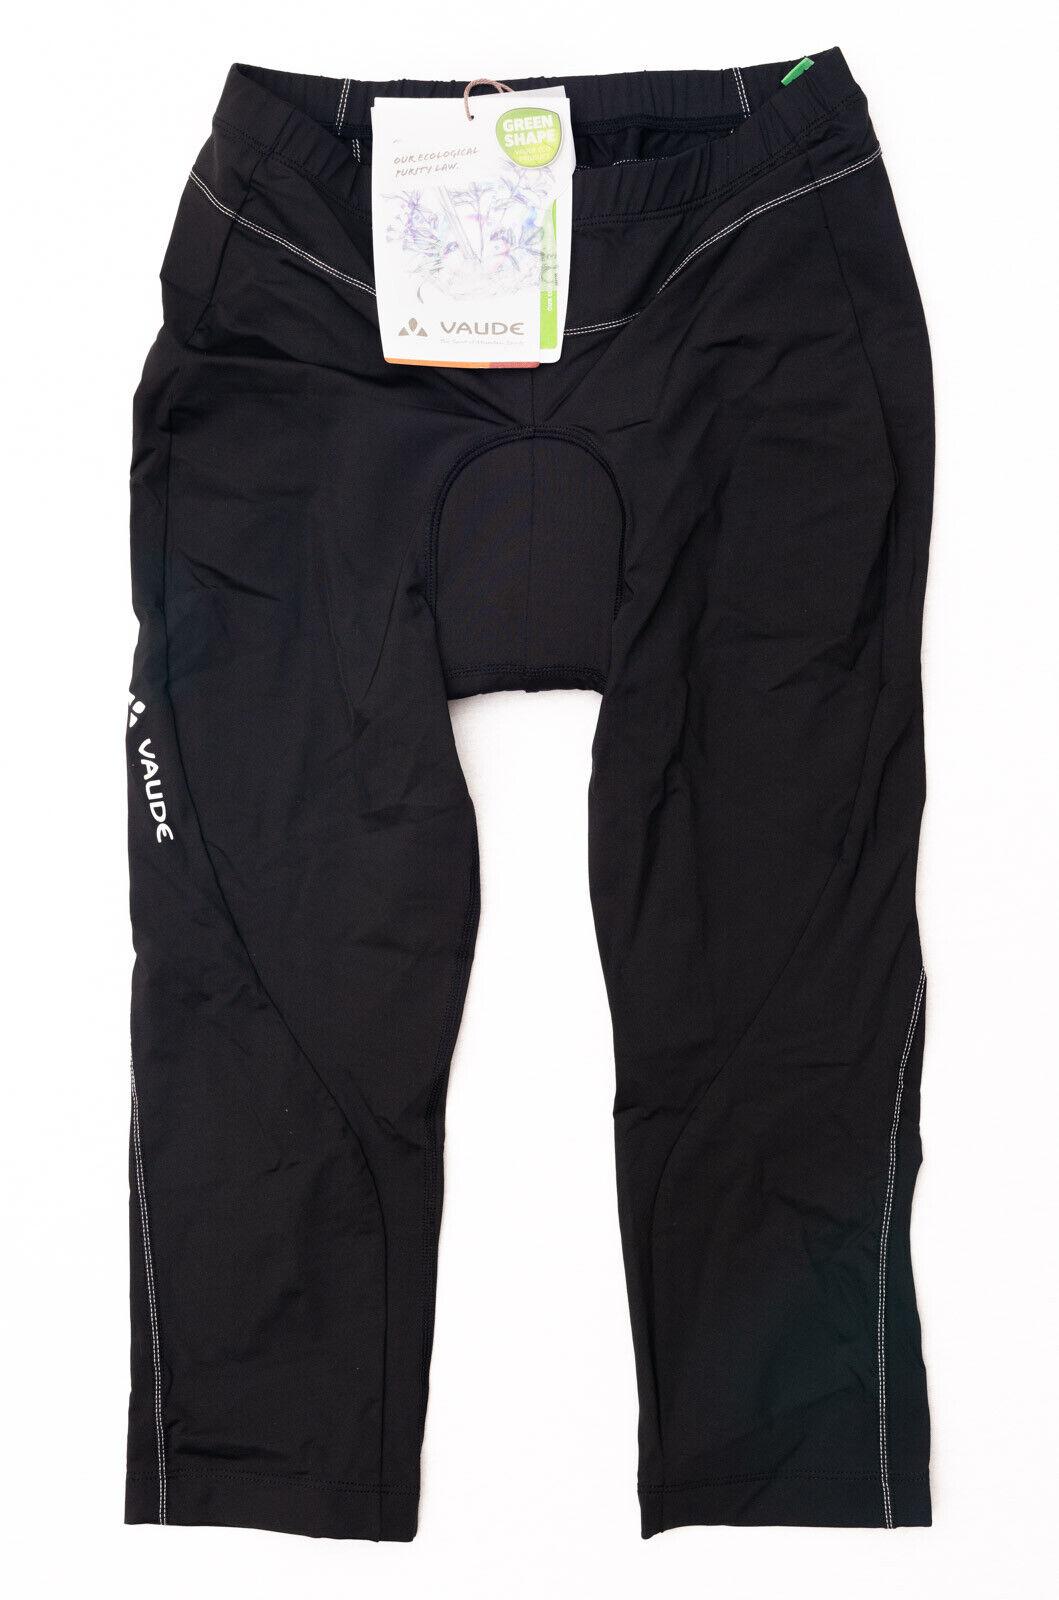 VAUDE Women's Active 3/4 Pants Damen Radhose, Gr.36/XS, Neu, UVP 55€